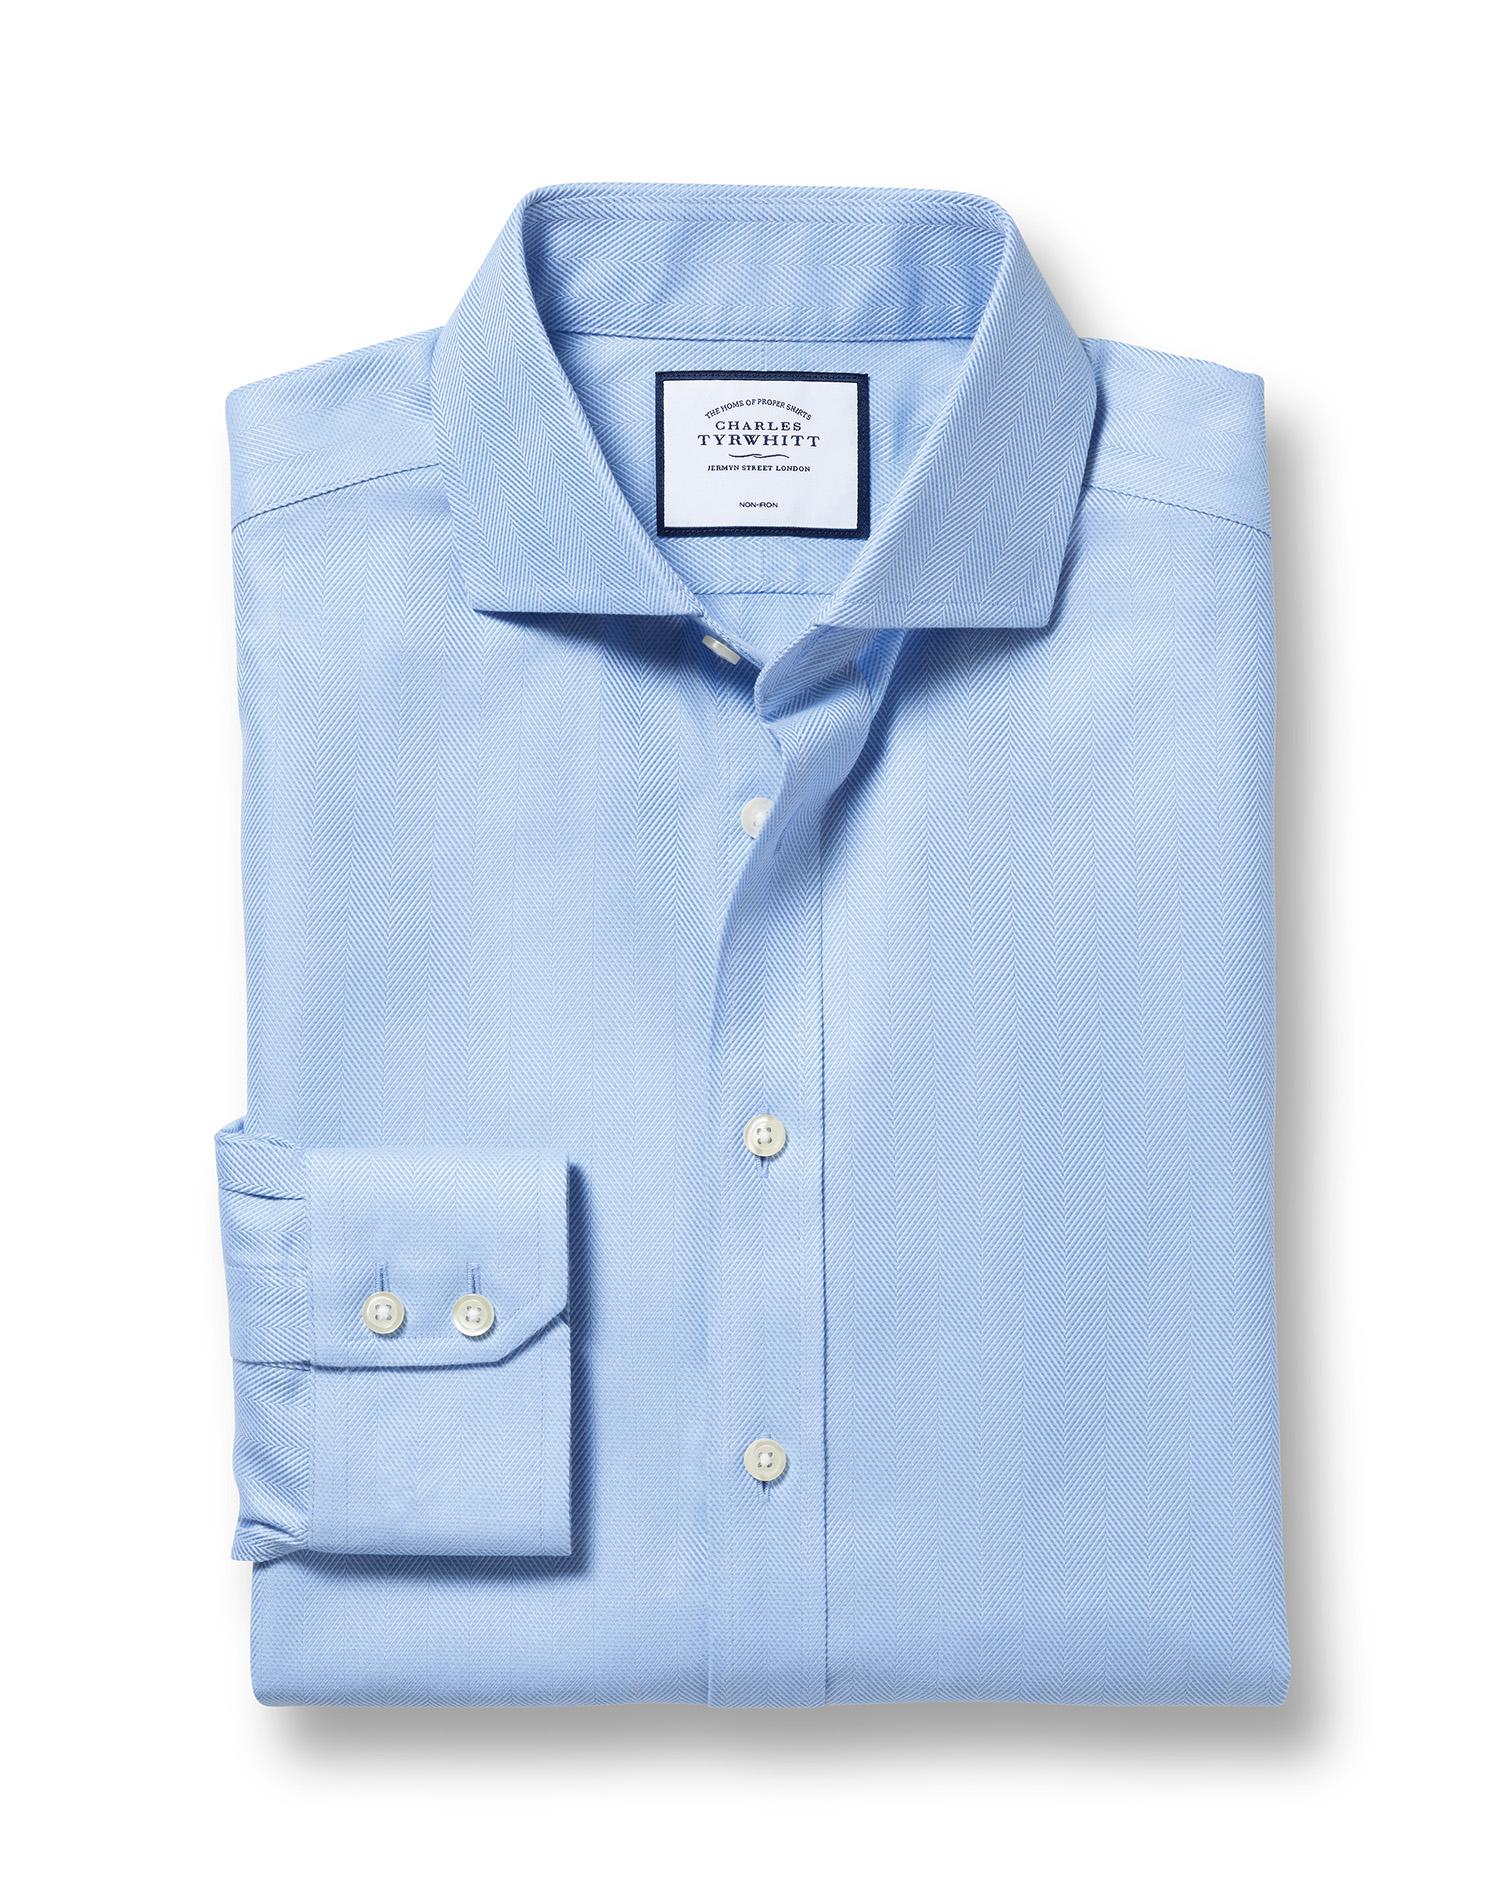 Slim Fit Cutaway Non-Iron Herringbone Sky Blue Cotton Formal Shirt Single Cuff Size 17.5/36 by Charl